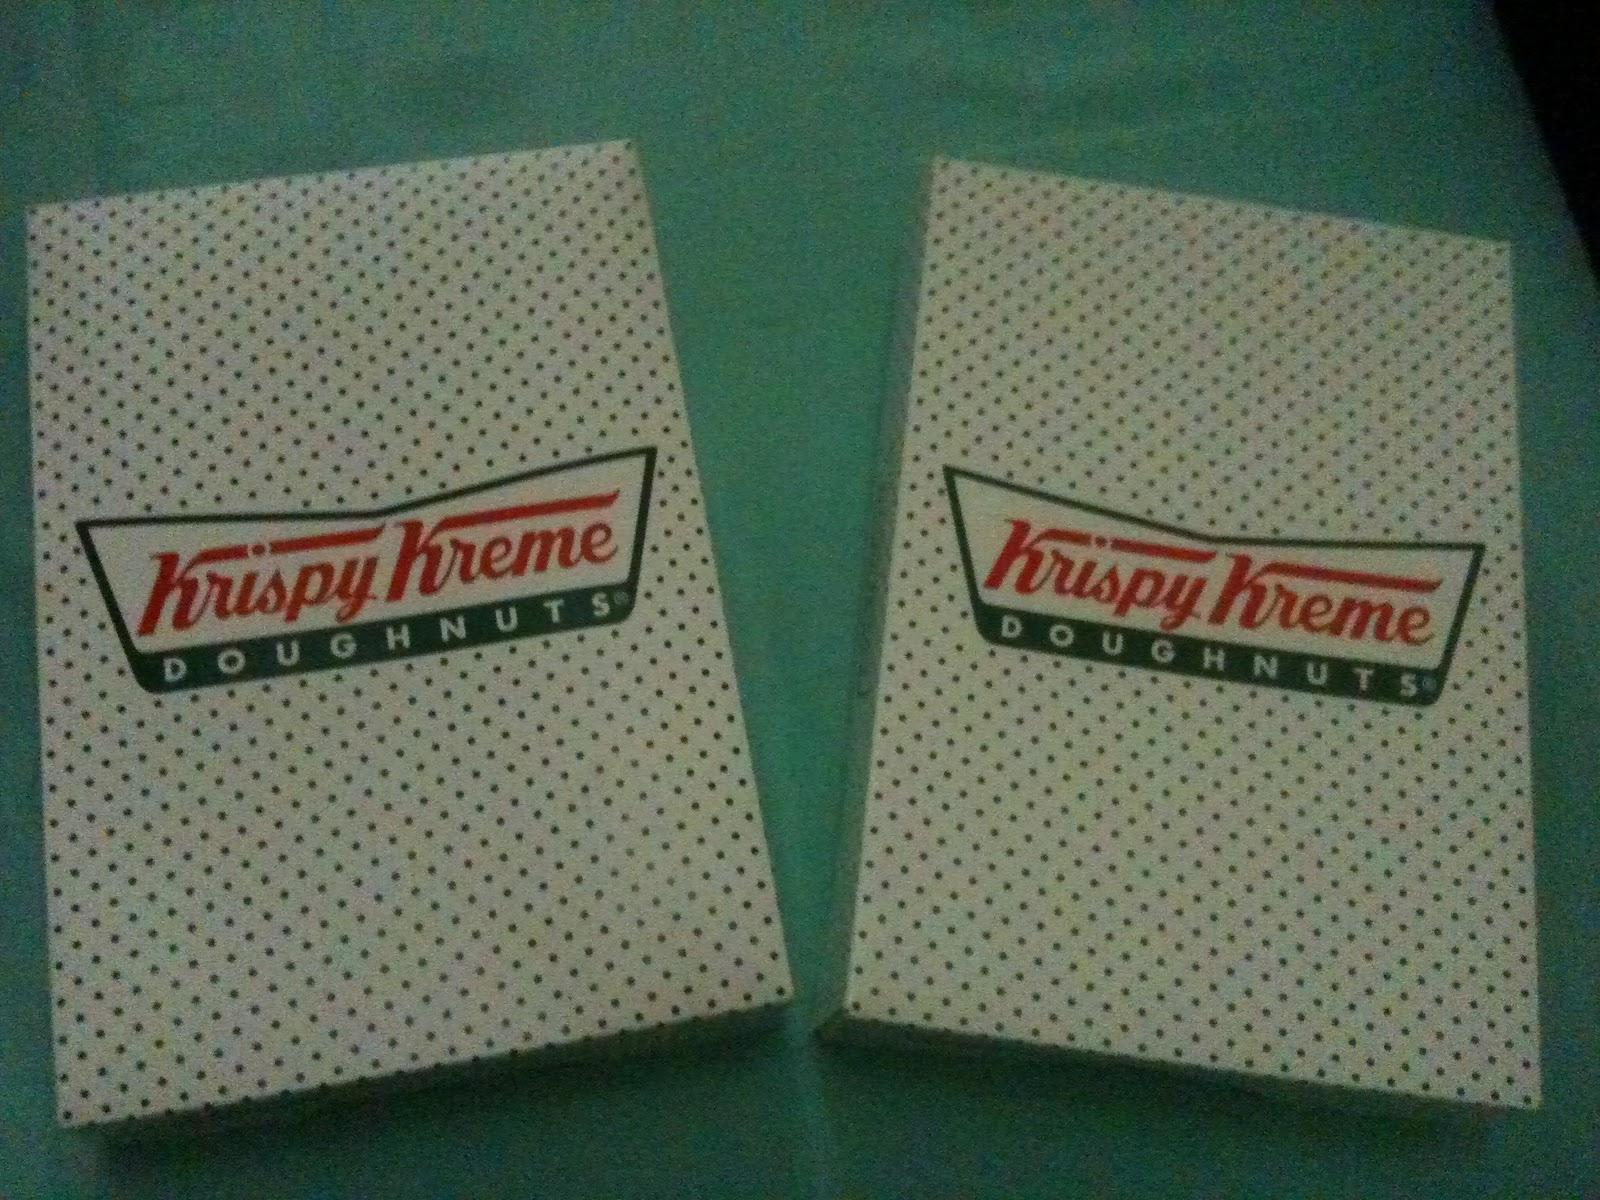 krispy kreme gonuts donuts Krispy kreme's signature treat, the original glazed™ doughnut, has set us apart ever since we started making them in the 1930s come try.